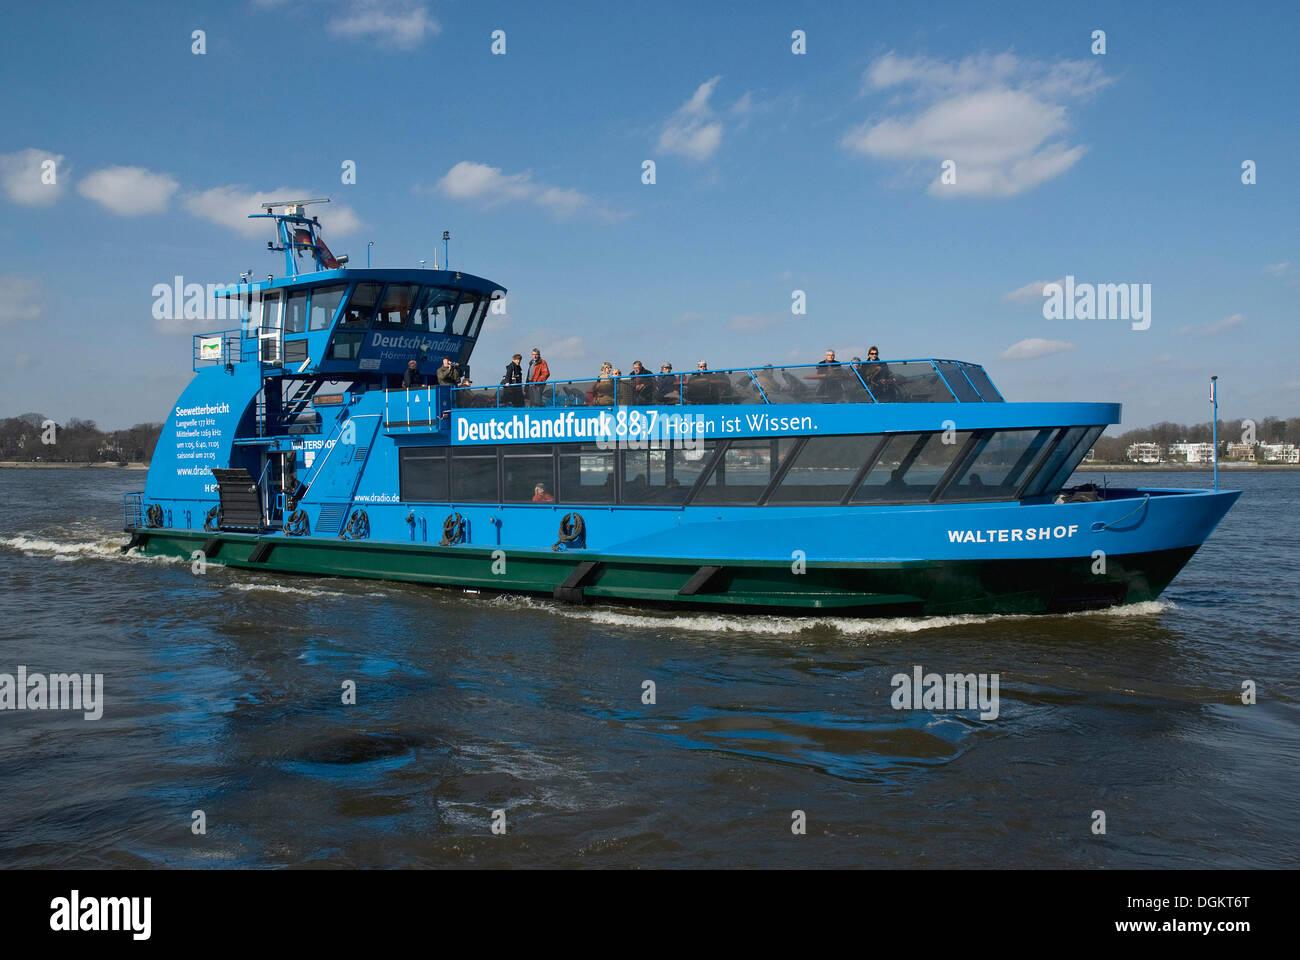 Public transport Hamburg, line 62, Waltershof port ferry on the Elbe river - Stock Image